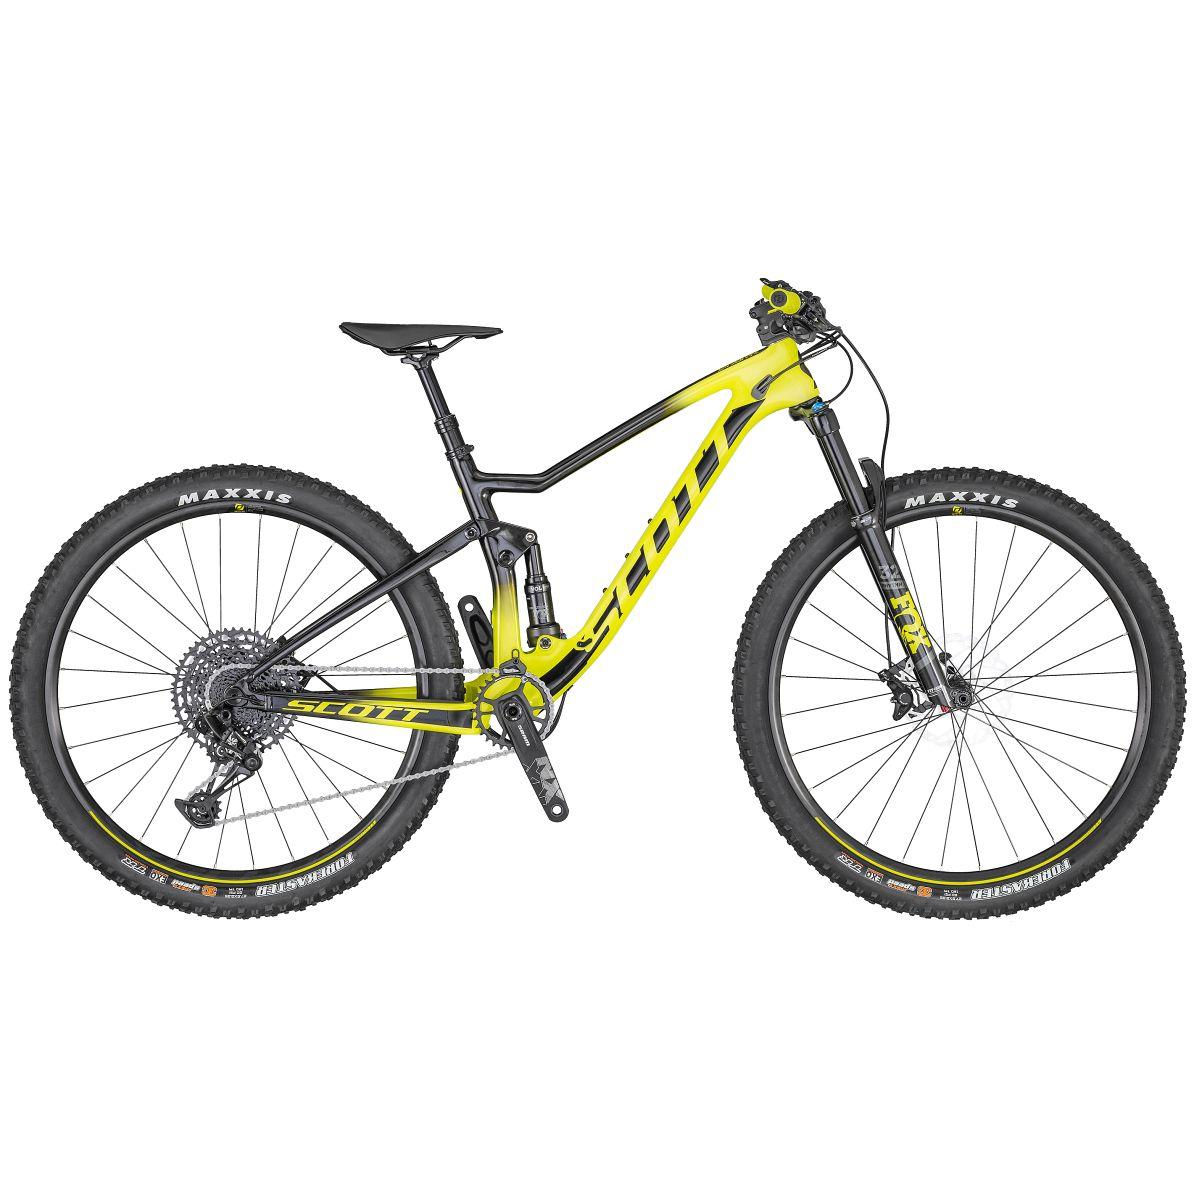 Scott Spark 700 Ultimate Mountain Bike 2018 - bikesale.com